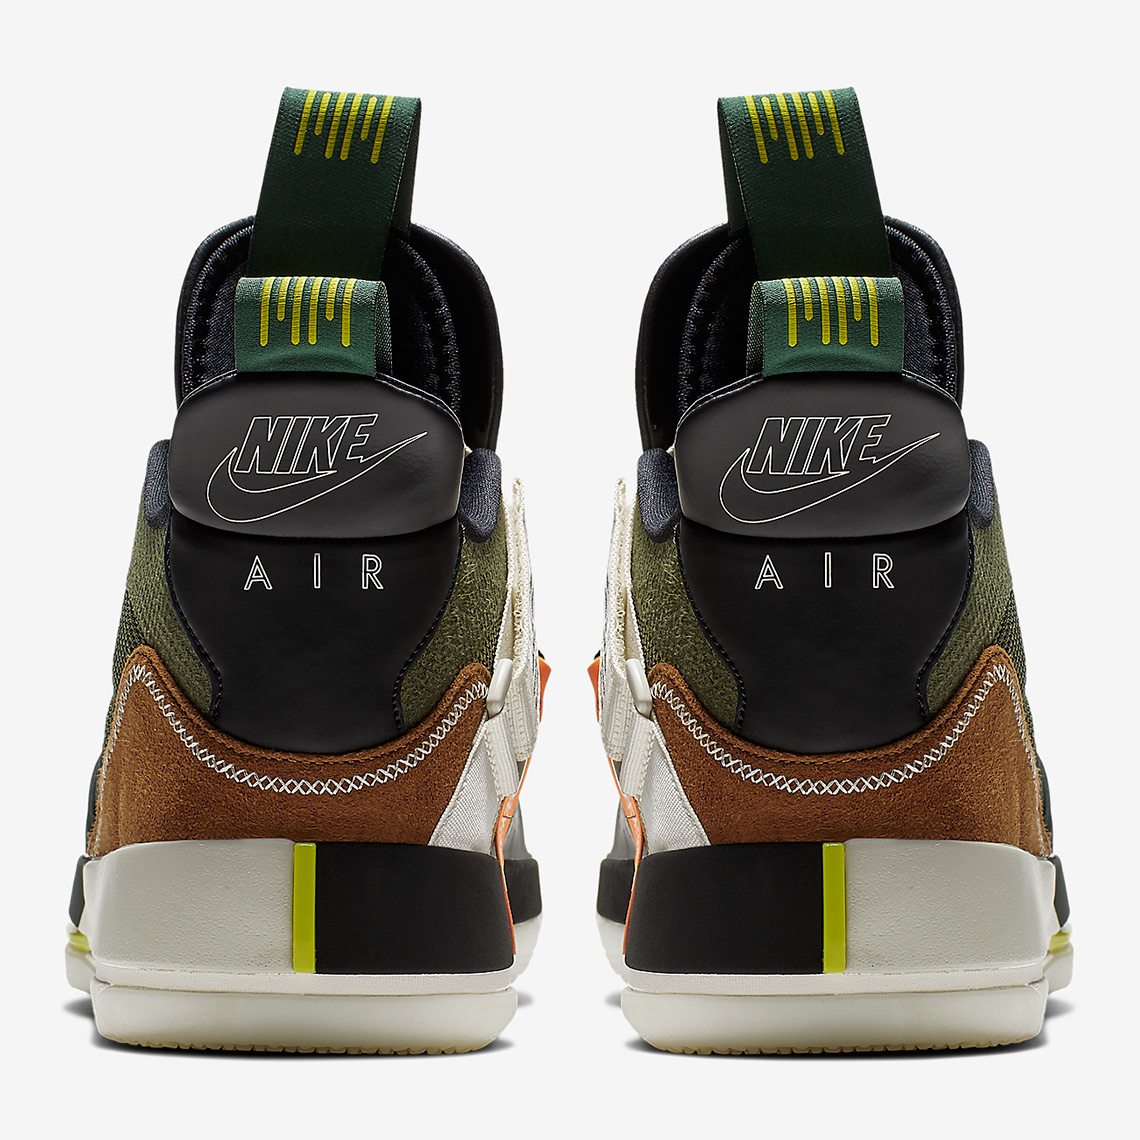 e60f0eeb815 Travis Scott Air Jordan 33 CD5965-300 Release Date | SneakerNews.com